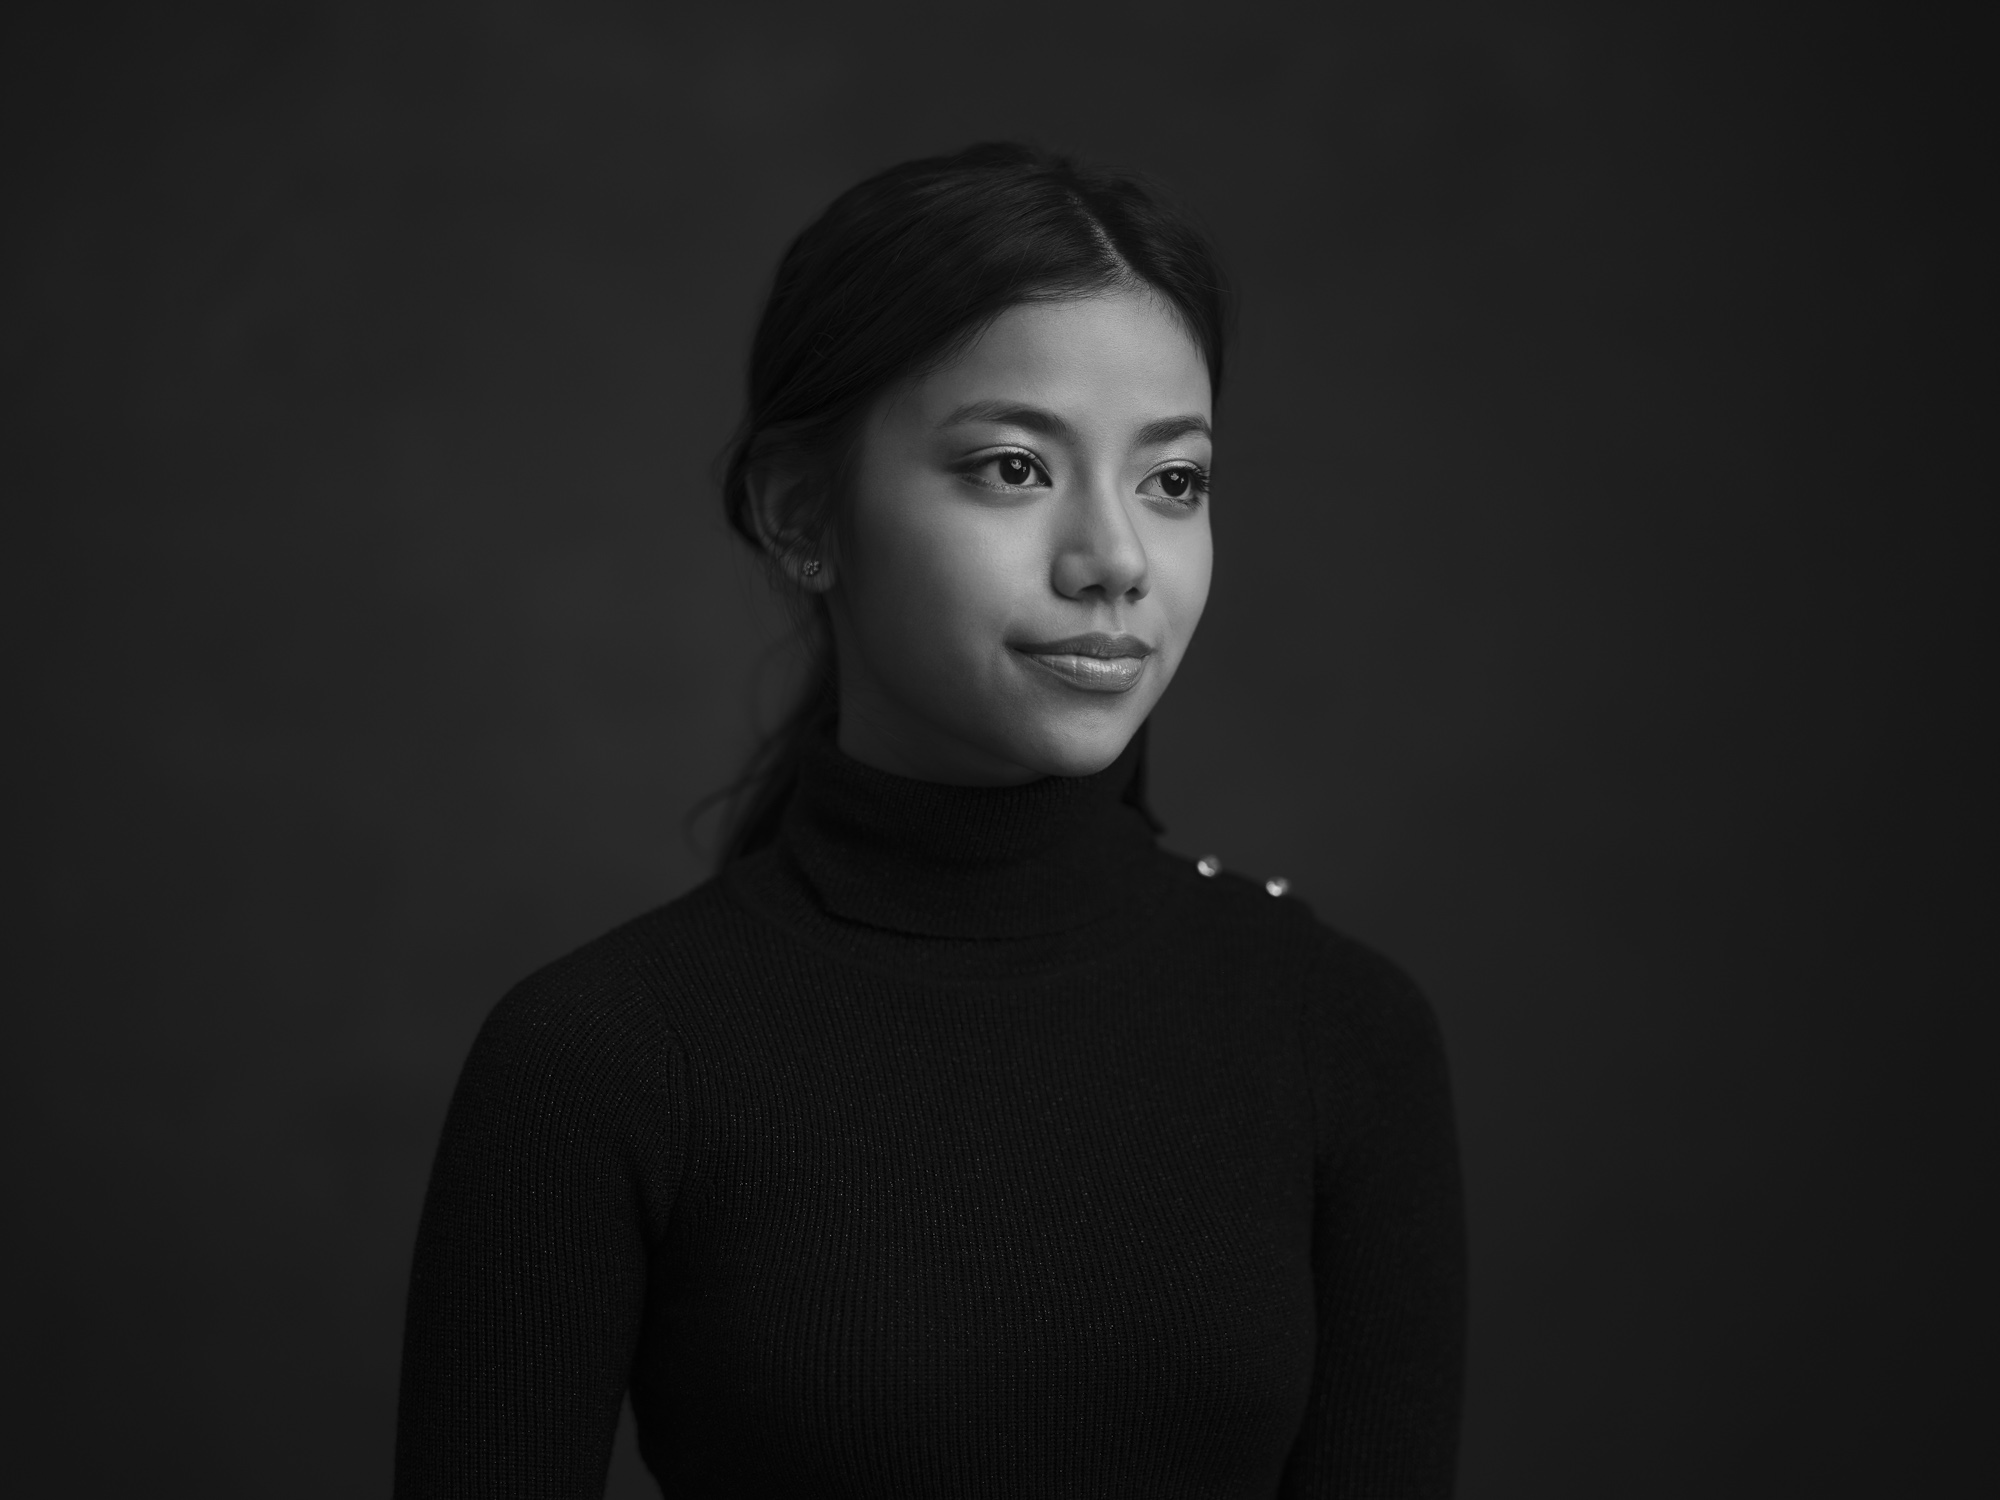 Black and white Portrait Session Headshot Photographer Singapore COCO Creative Studio 2